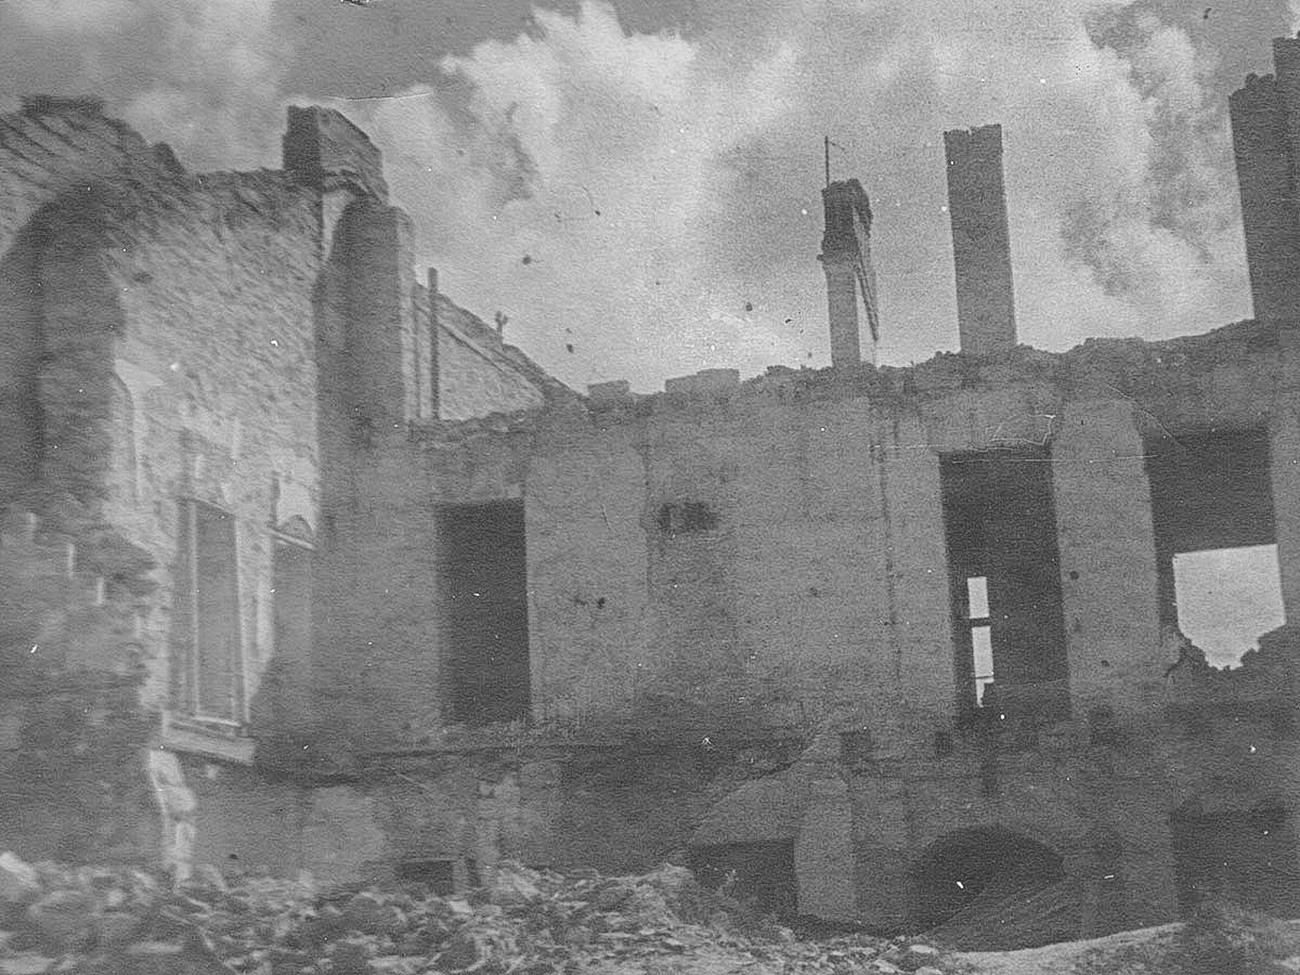 Bangunan tempat tinggal di Leninskaya ulitsa.